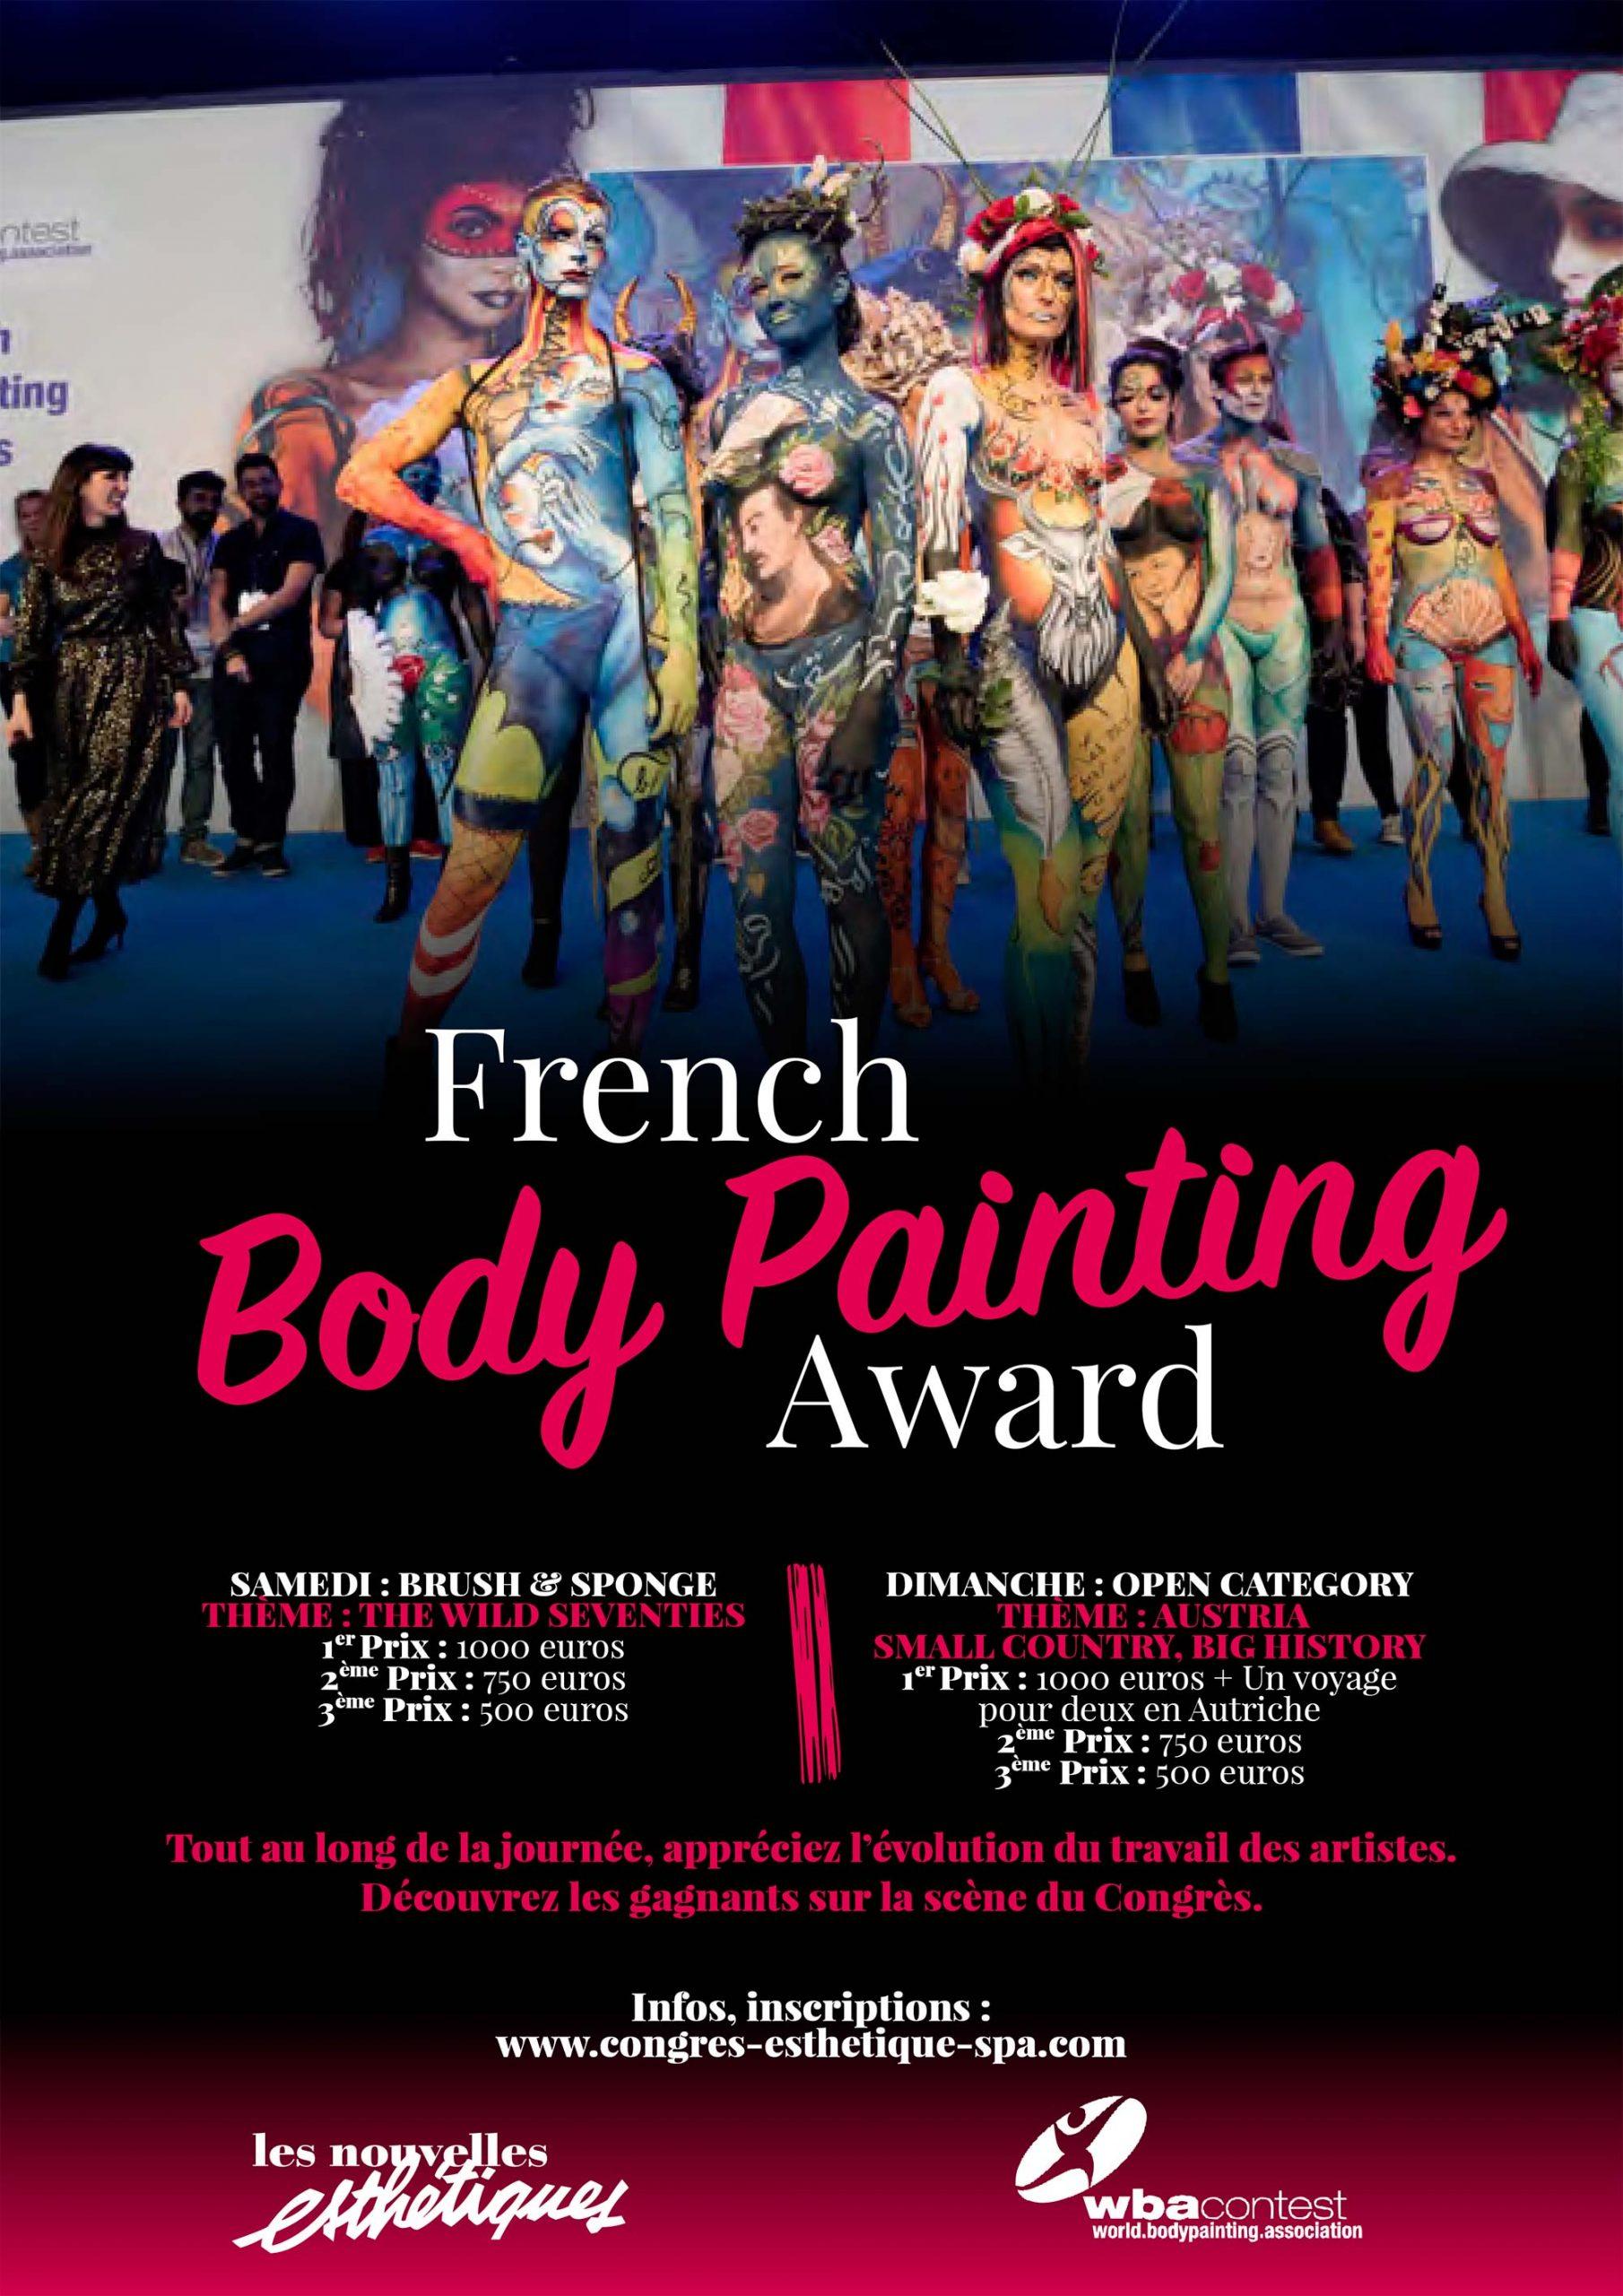 French Bodypainting Award 2020